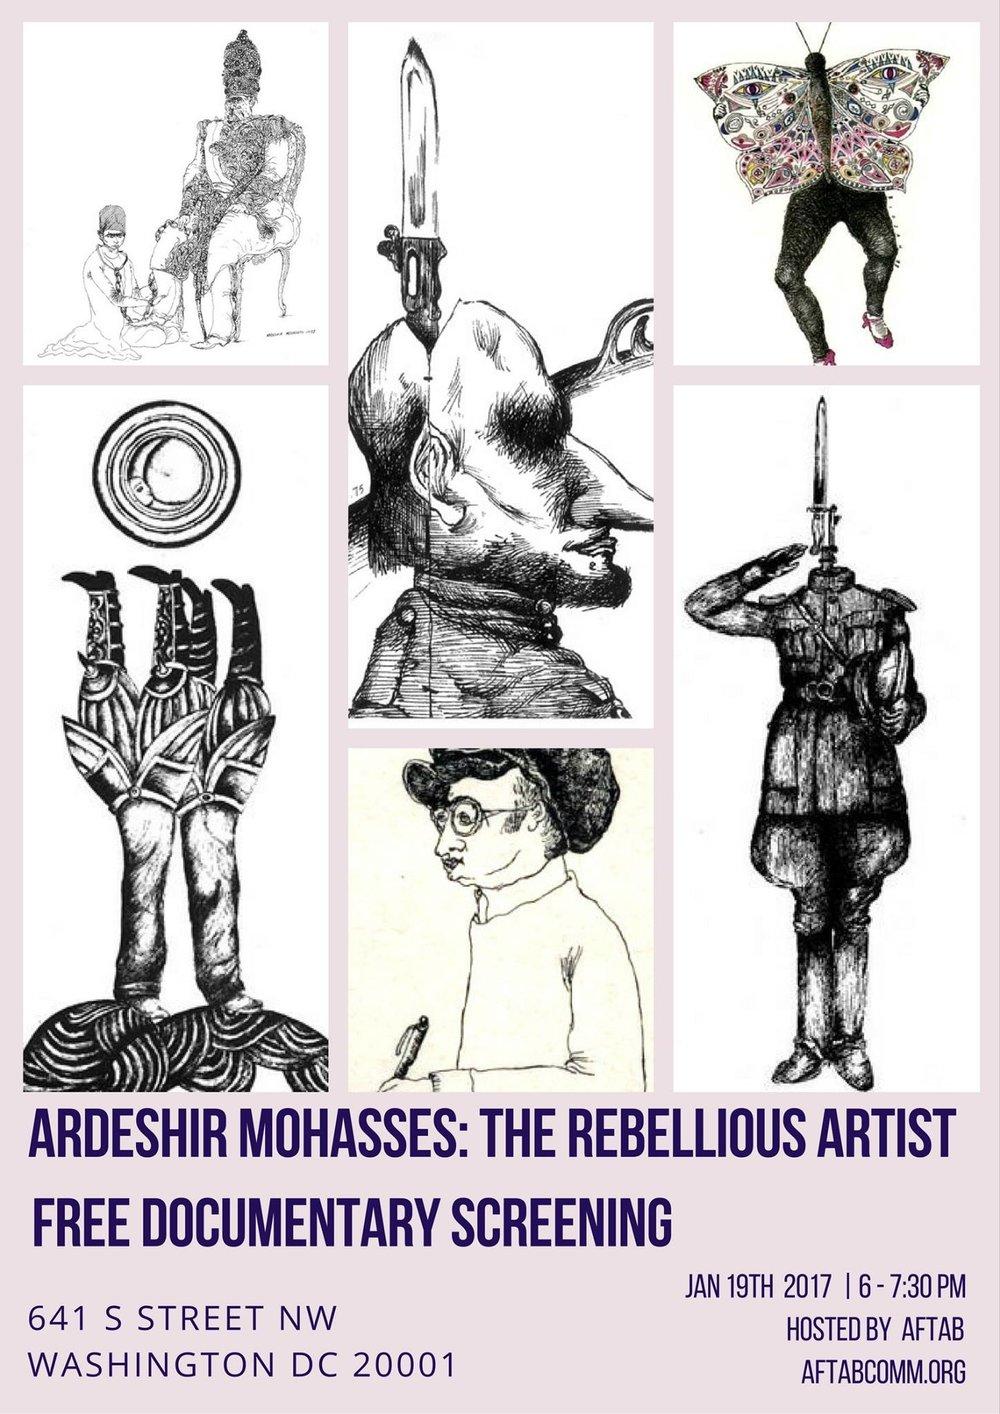 Ardeshir Mohasses: The Rebellious Artist Documentary Screening